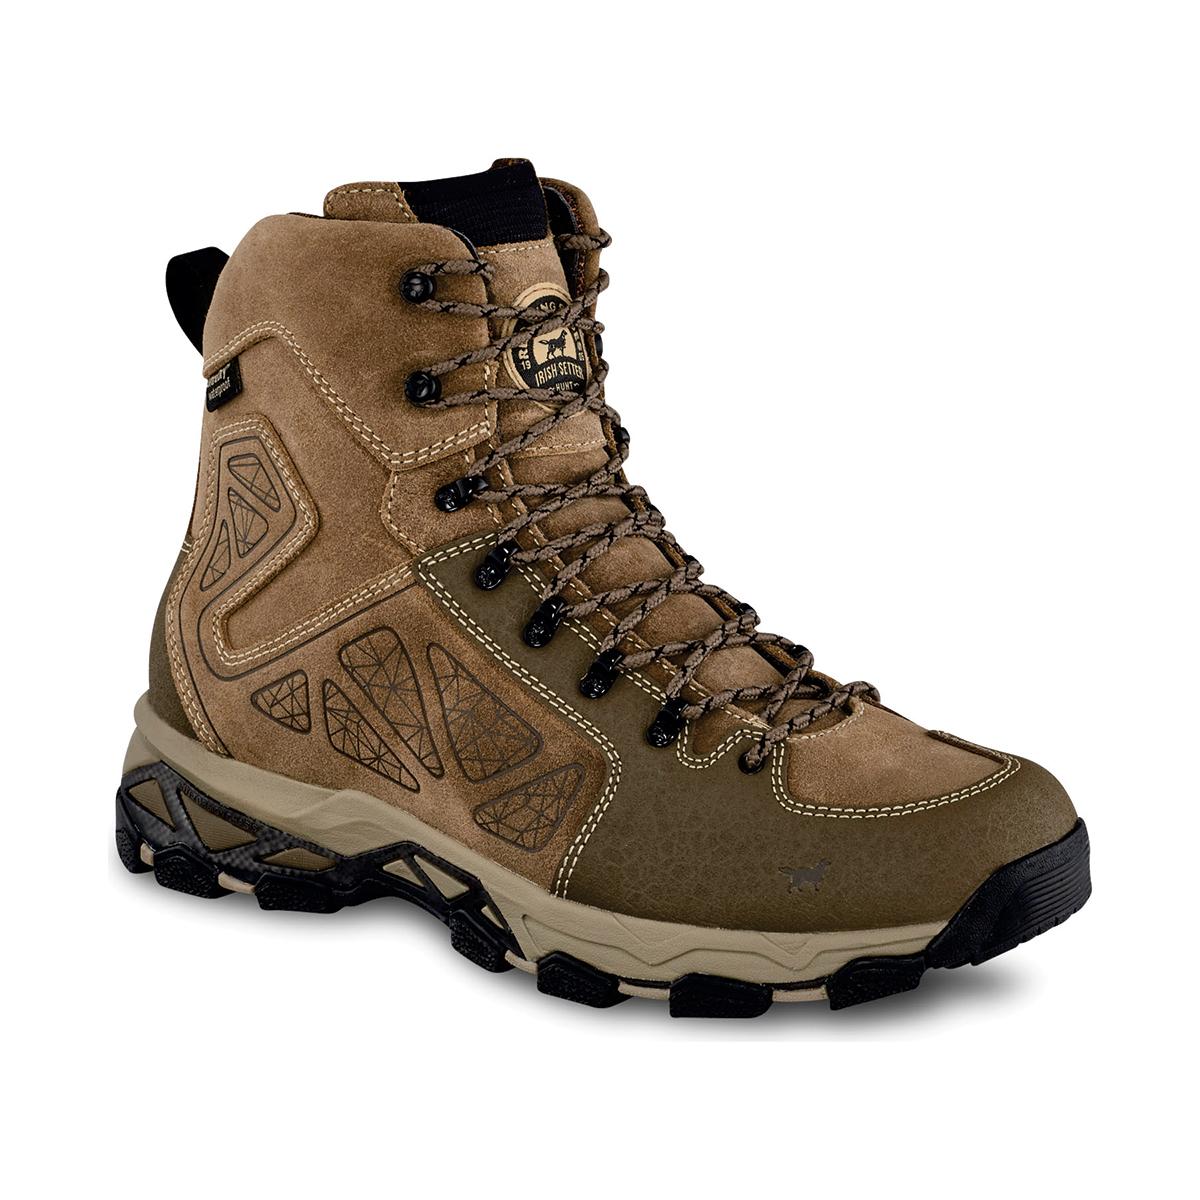 543ca764 Details about Irish Setter Ravine 2884 Hunting Boot